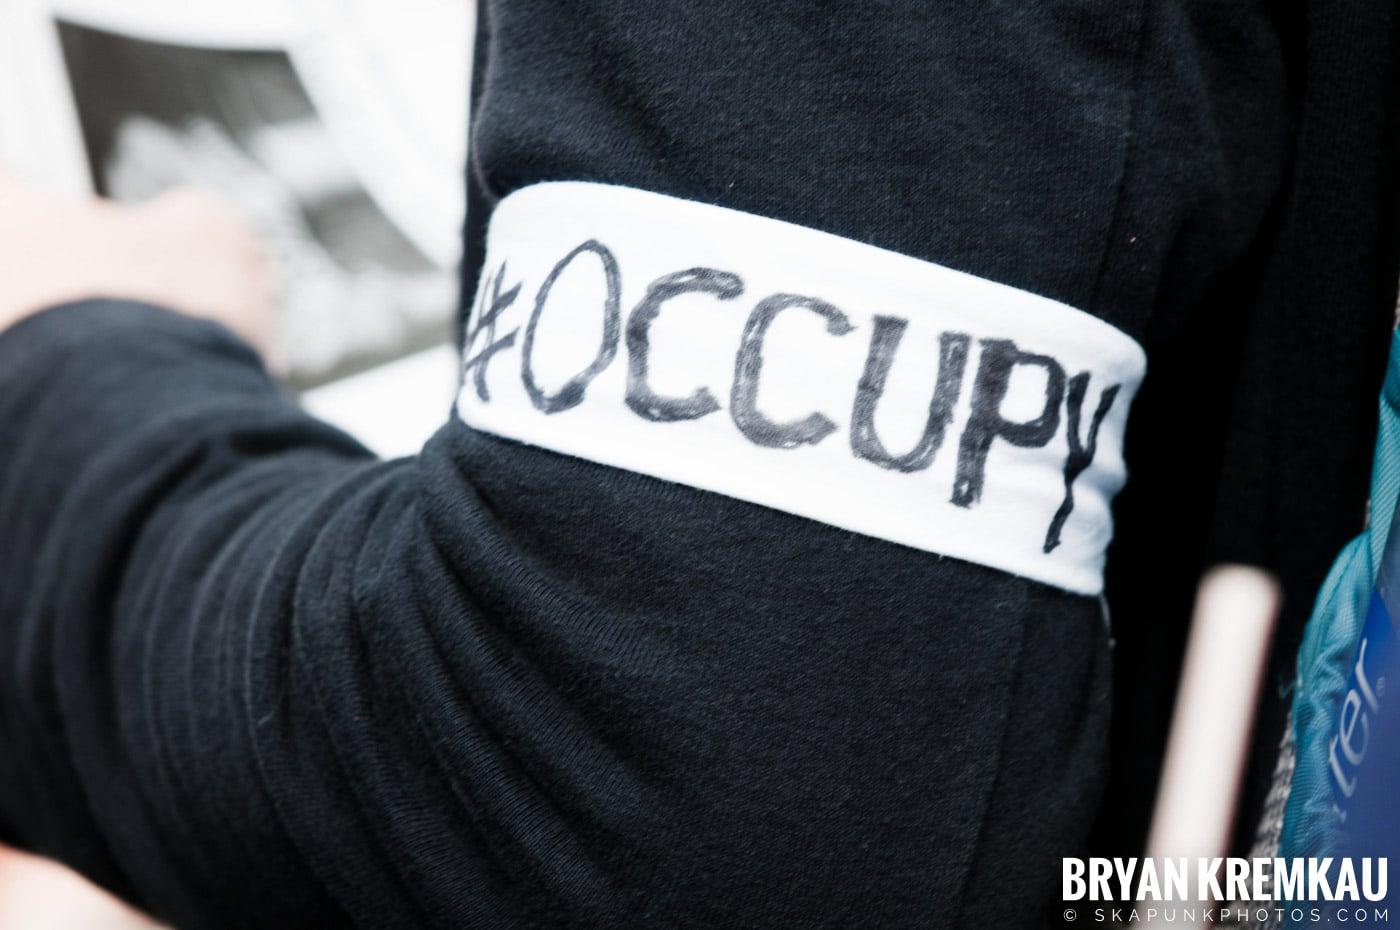 Occupy Wall Street @ Zuccotti Park and Washington Square Park, NYC - 10.15.11 (76)